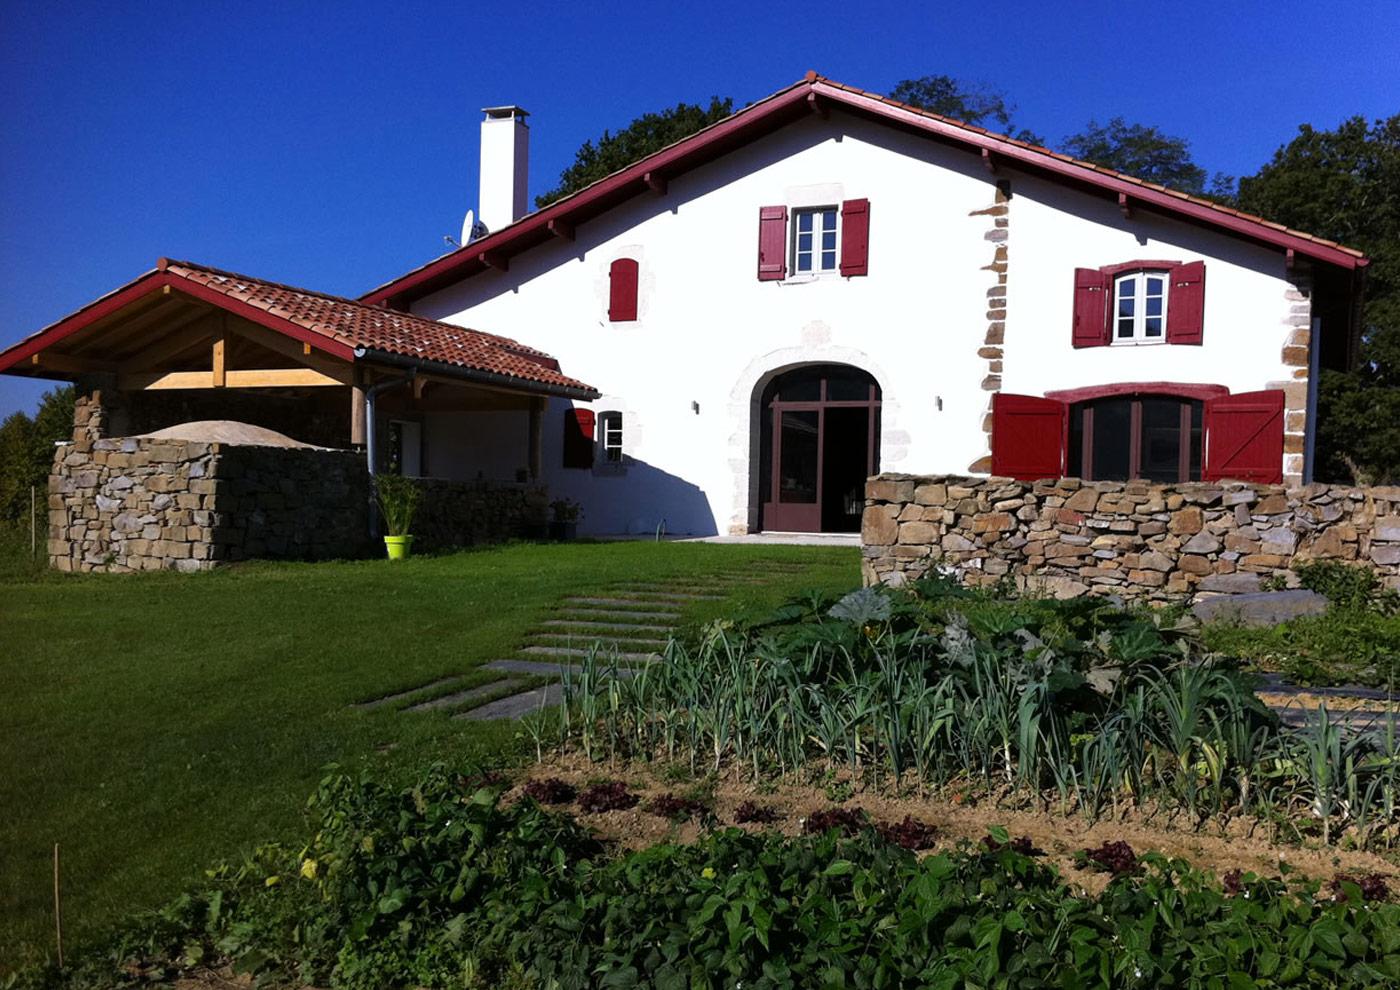 Alaman Architectes Renovation Maison Bardos - Construction Pays Basque